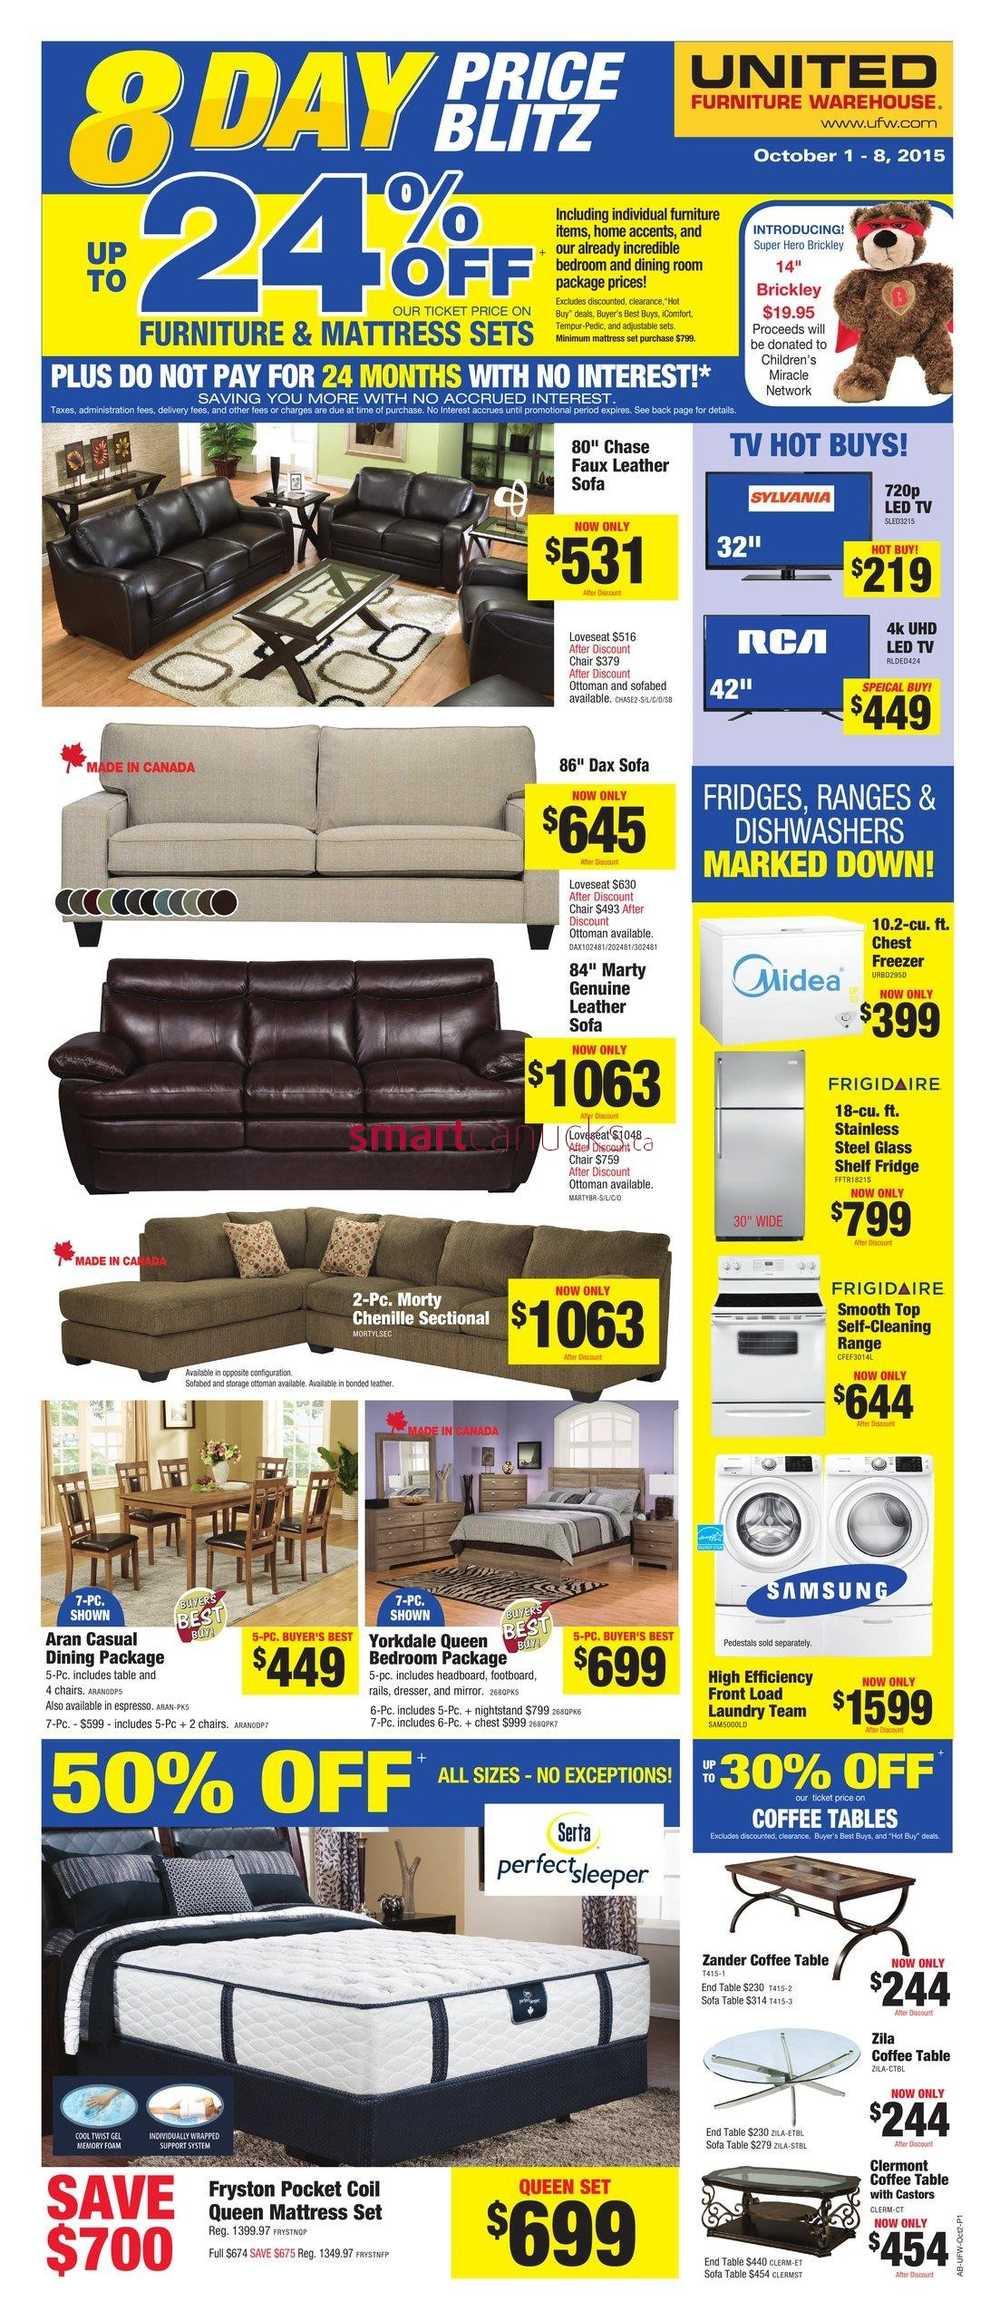 United Furniture Warehouse United Furniture Warehouse Flyer October 1